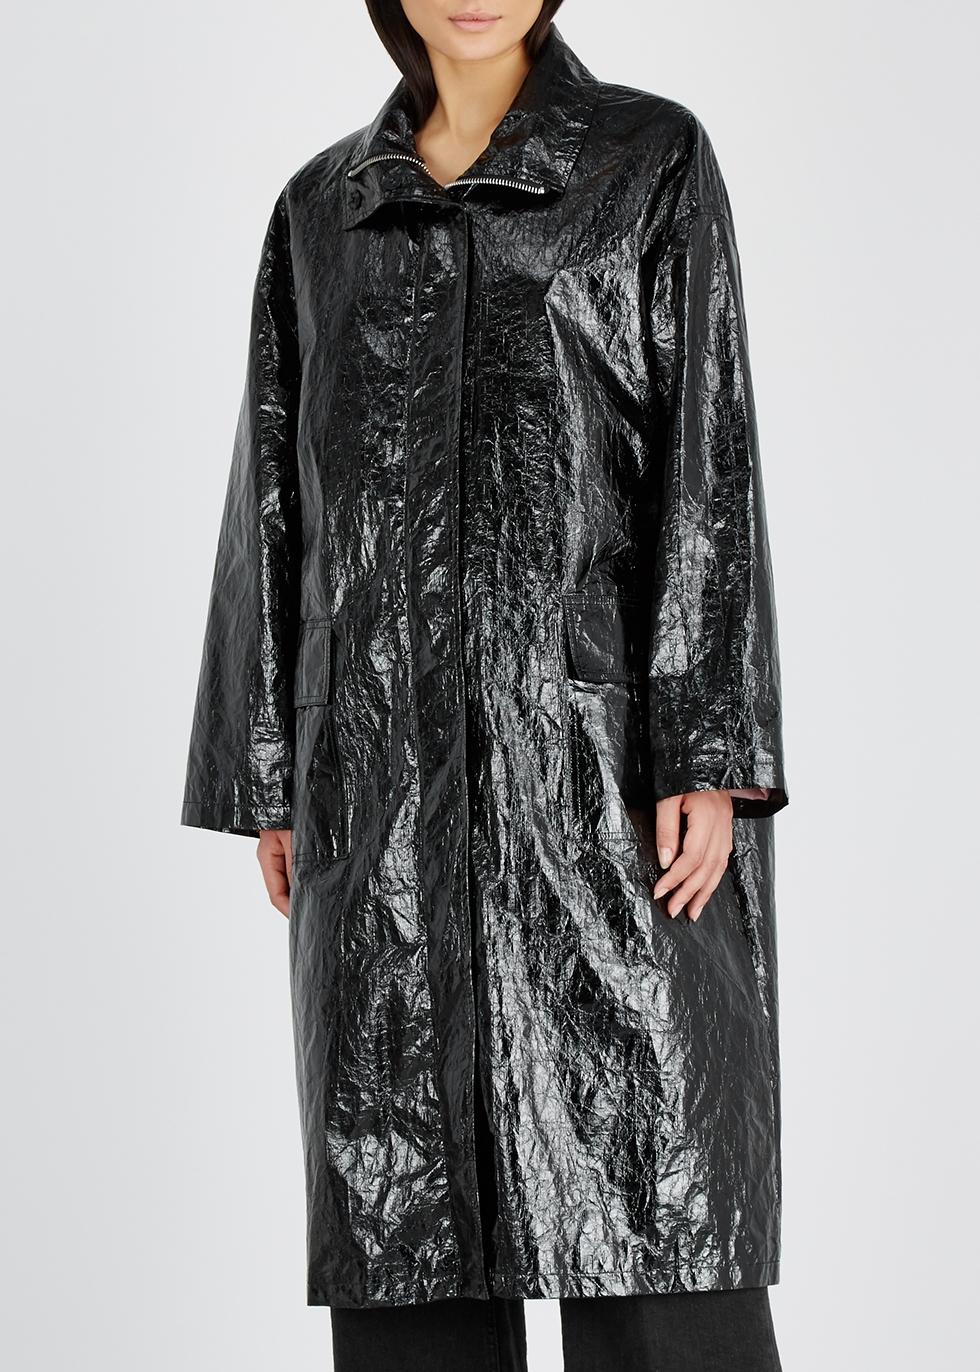 Maia black patent coat - Stand